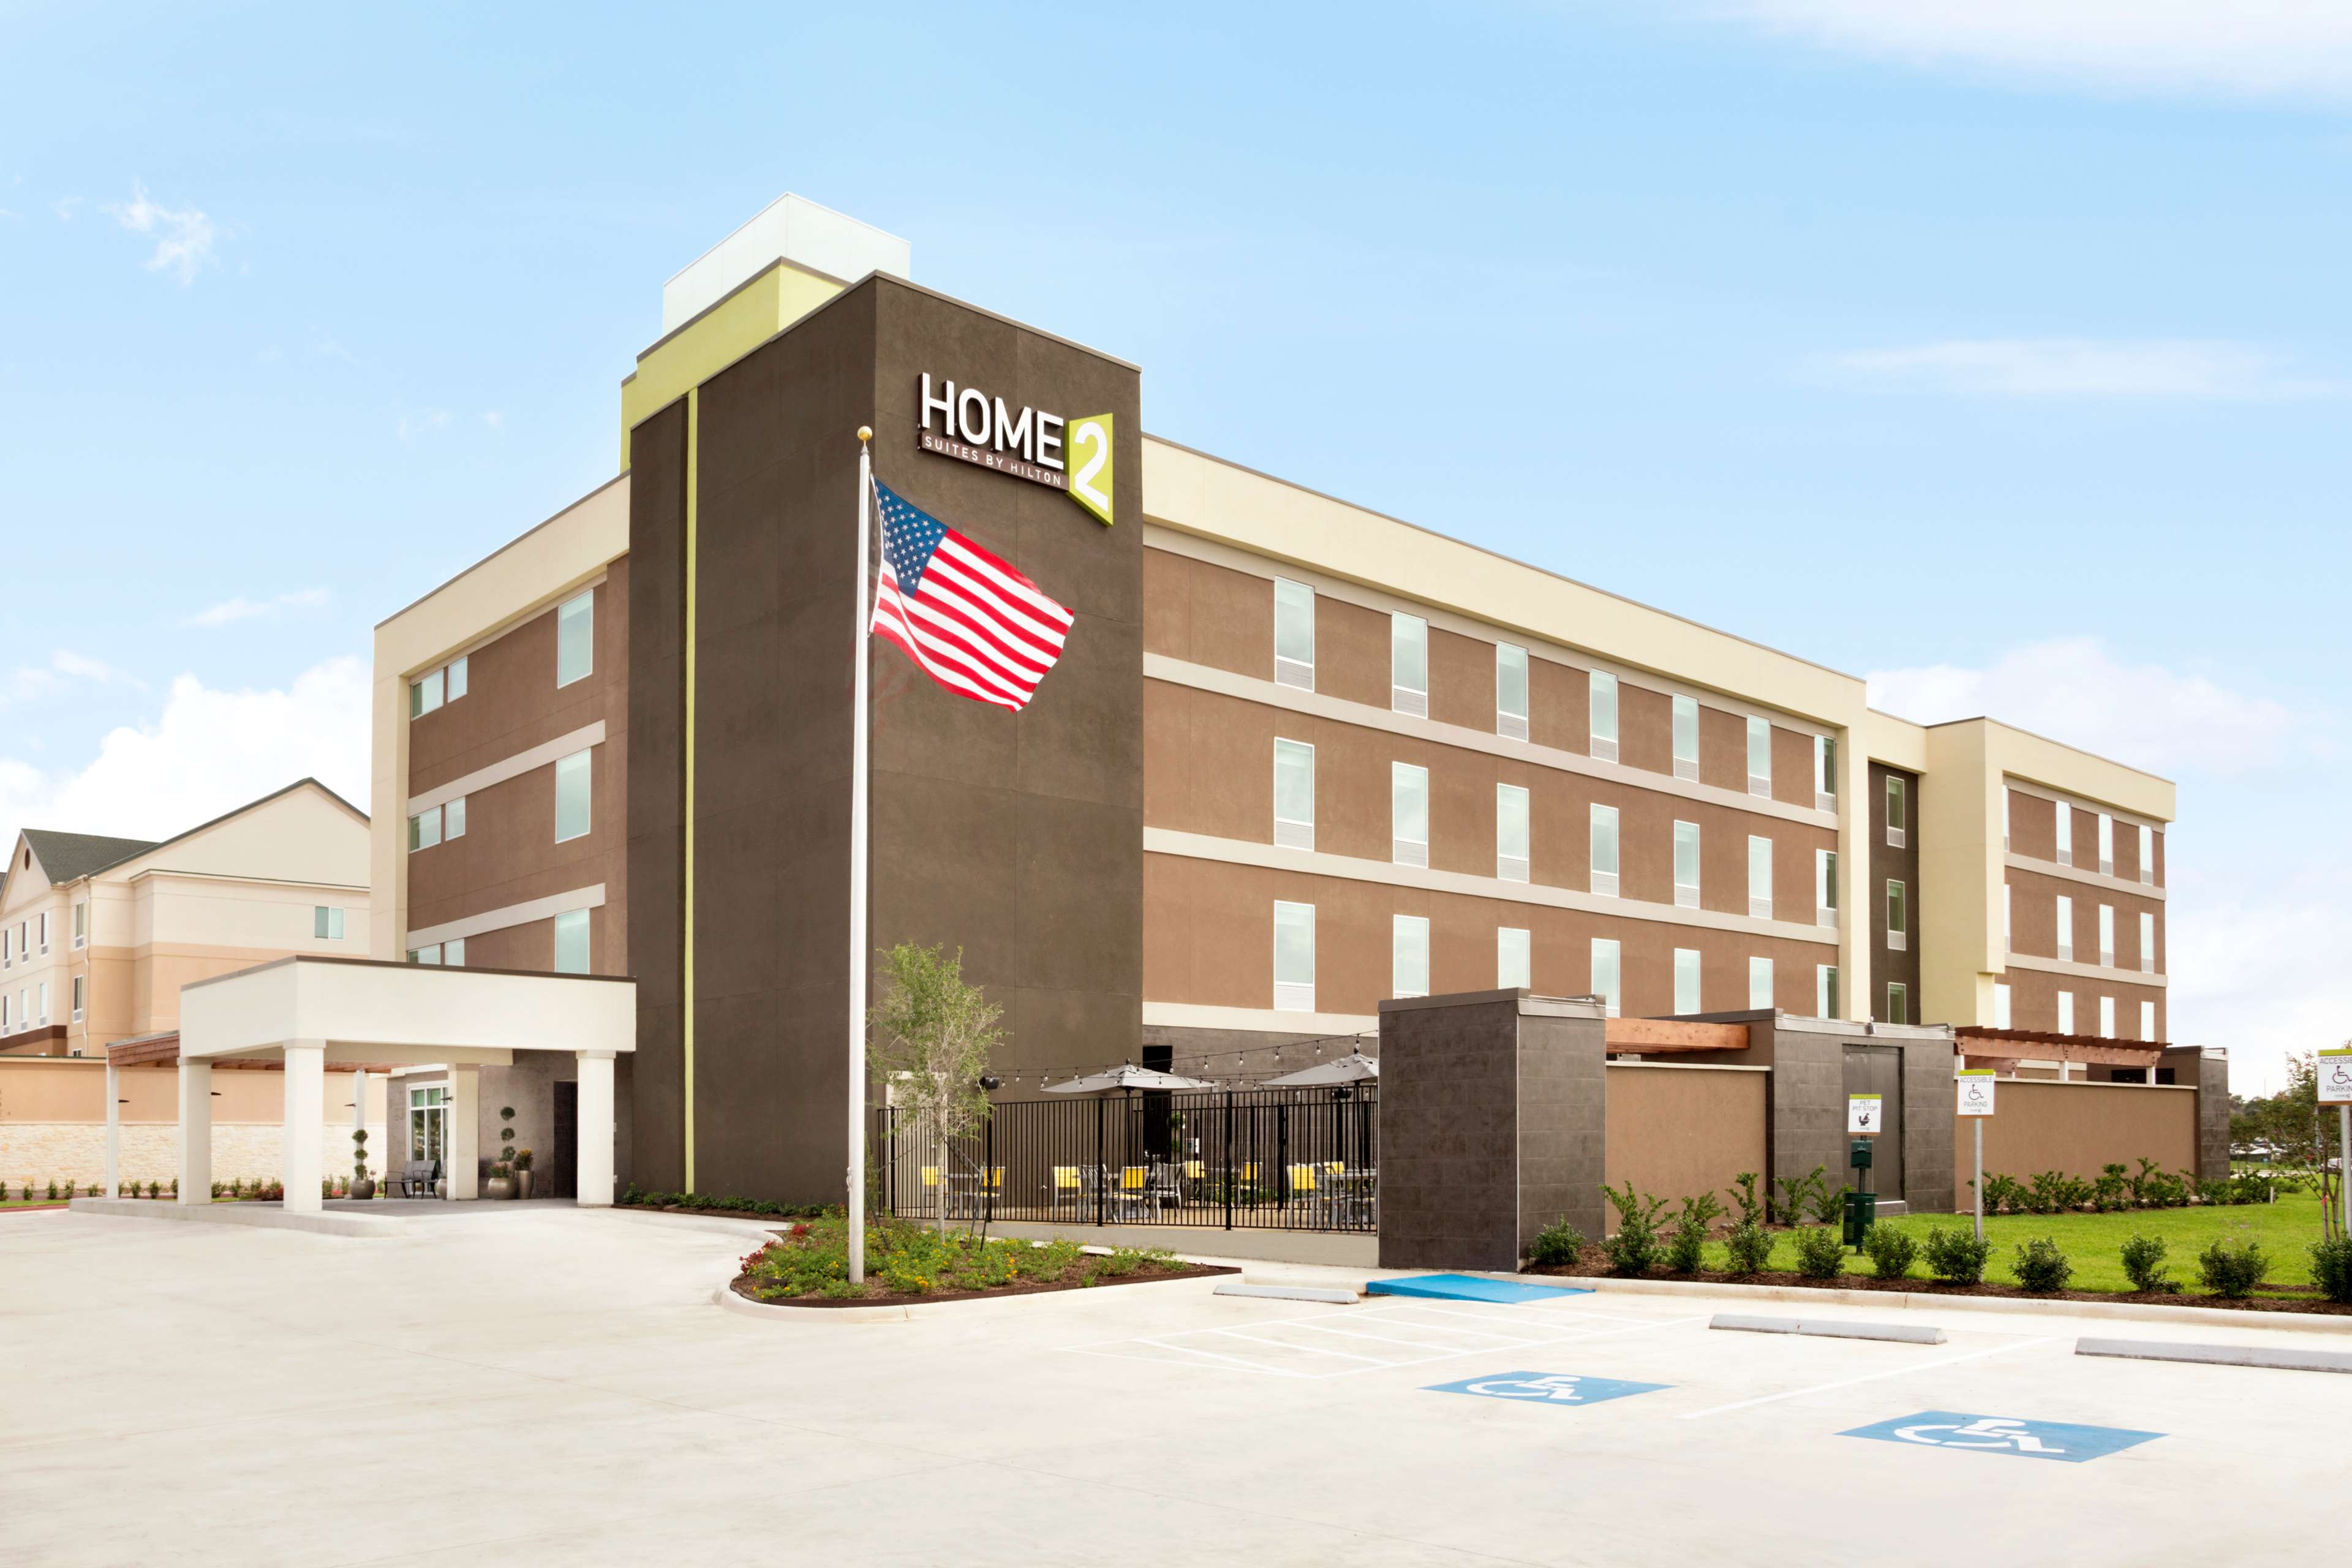 Home2 Suites by Hilton Houston/Webster image 0